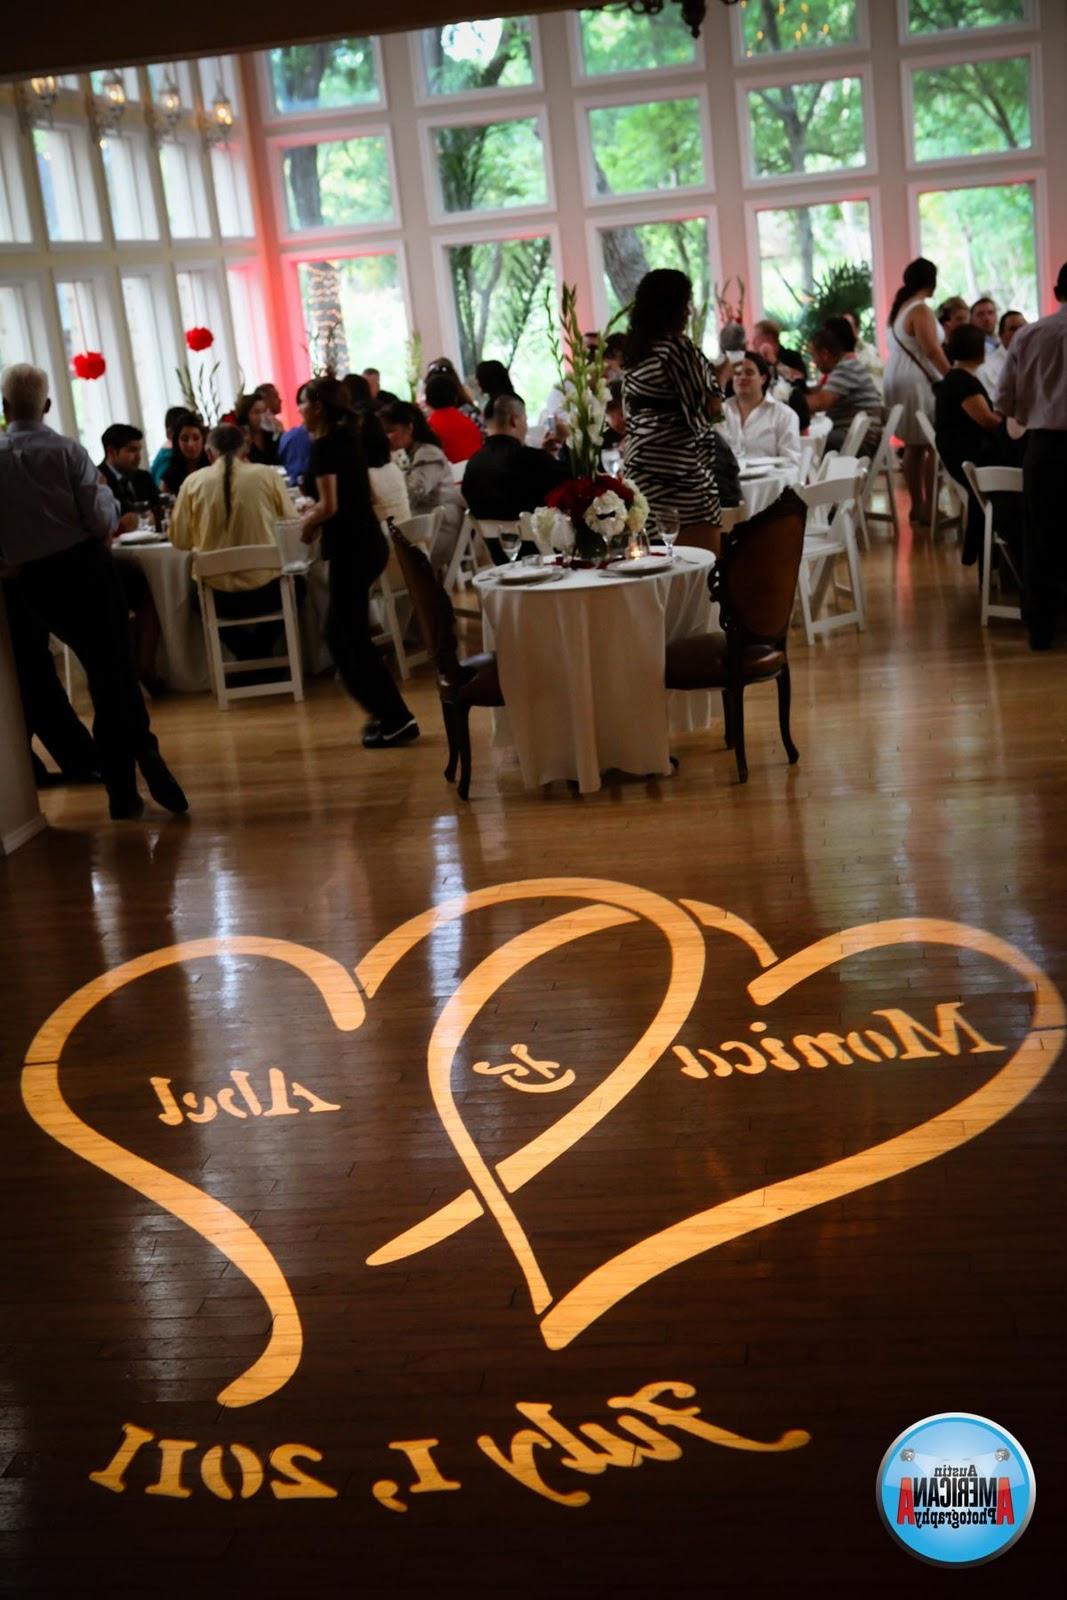 Tags: casa blanca wedding,